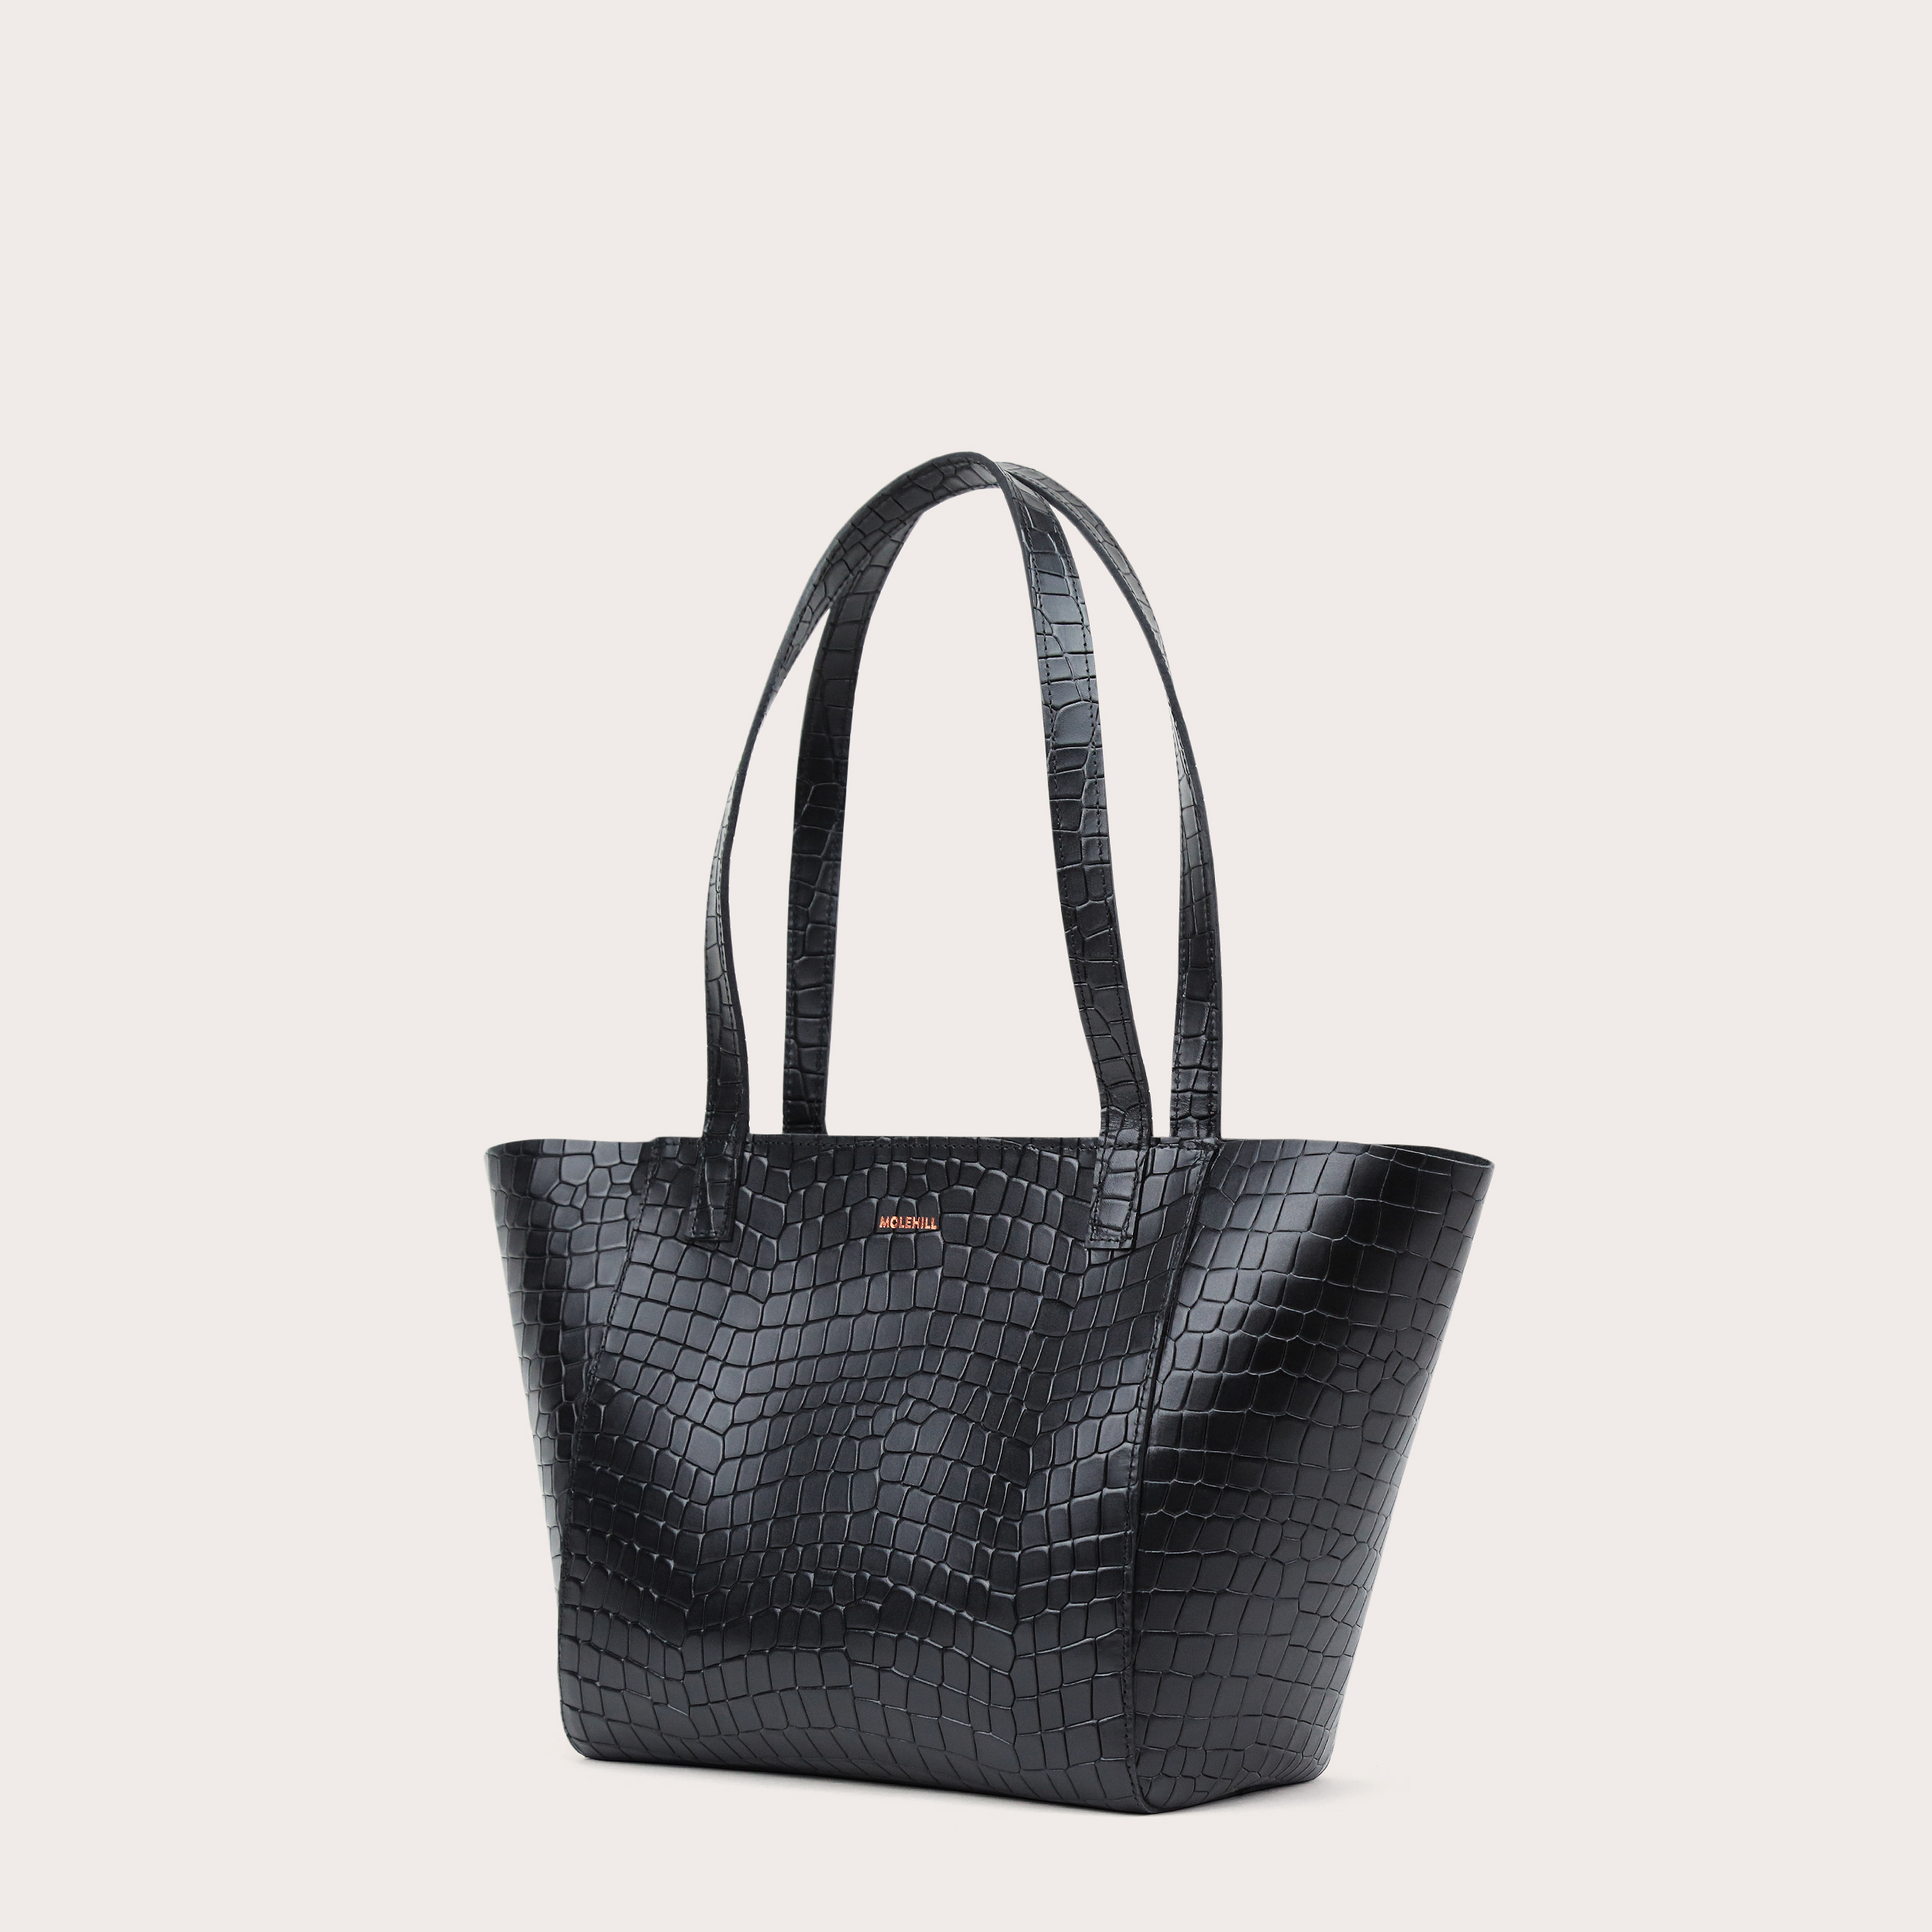 Torba ESTE Regular Zip Shopper Bag Croco Black 1-3